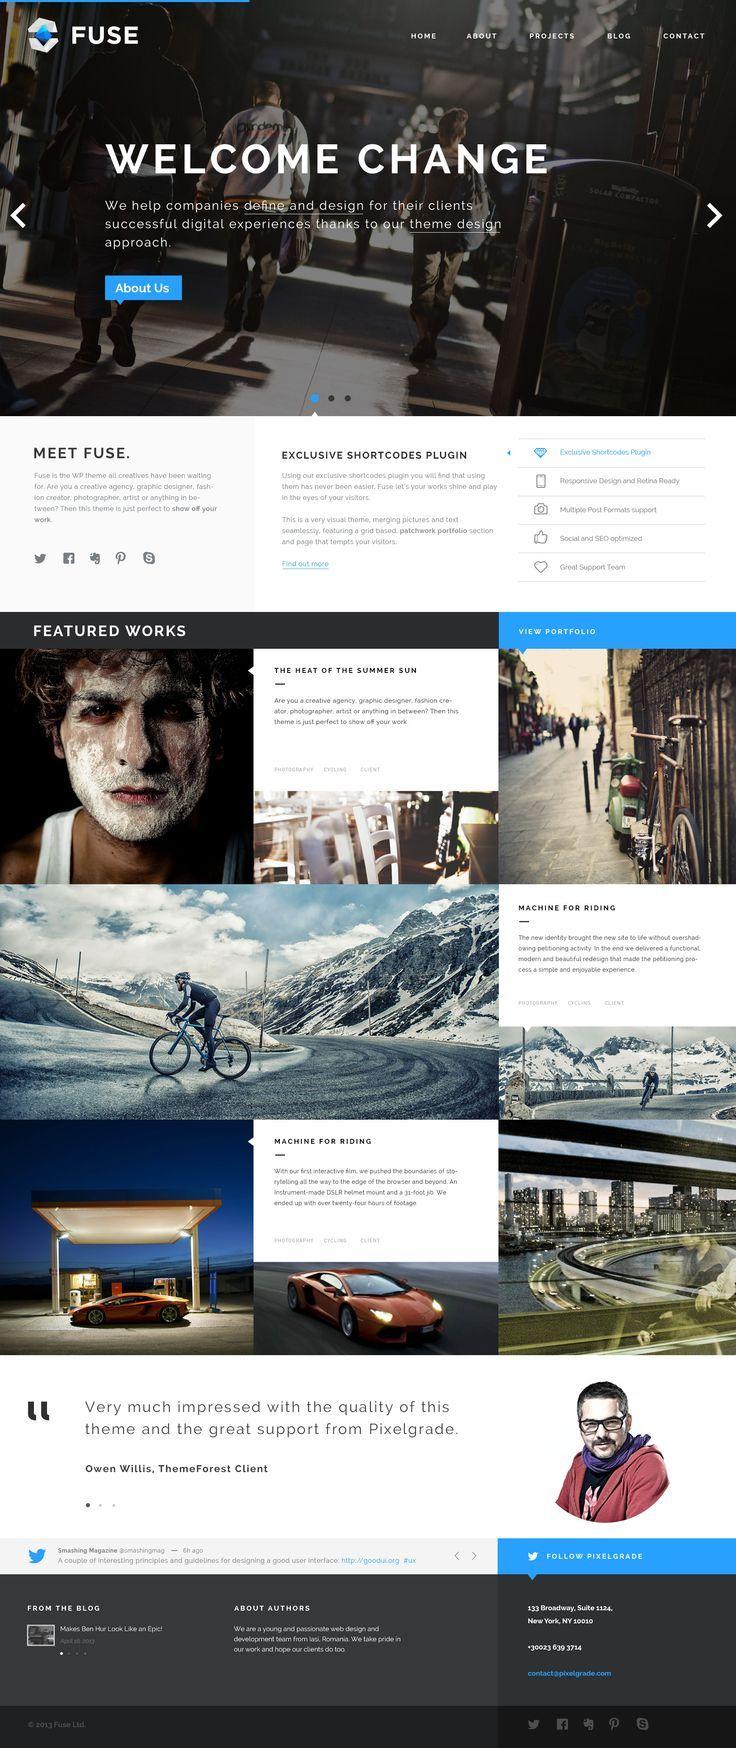 Pin By Gustavo Dallegrave On Web Layout Web Development Design Web Design Inspiration Web Layout Design